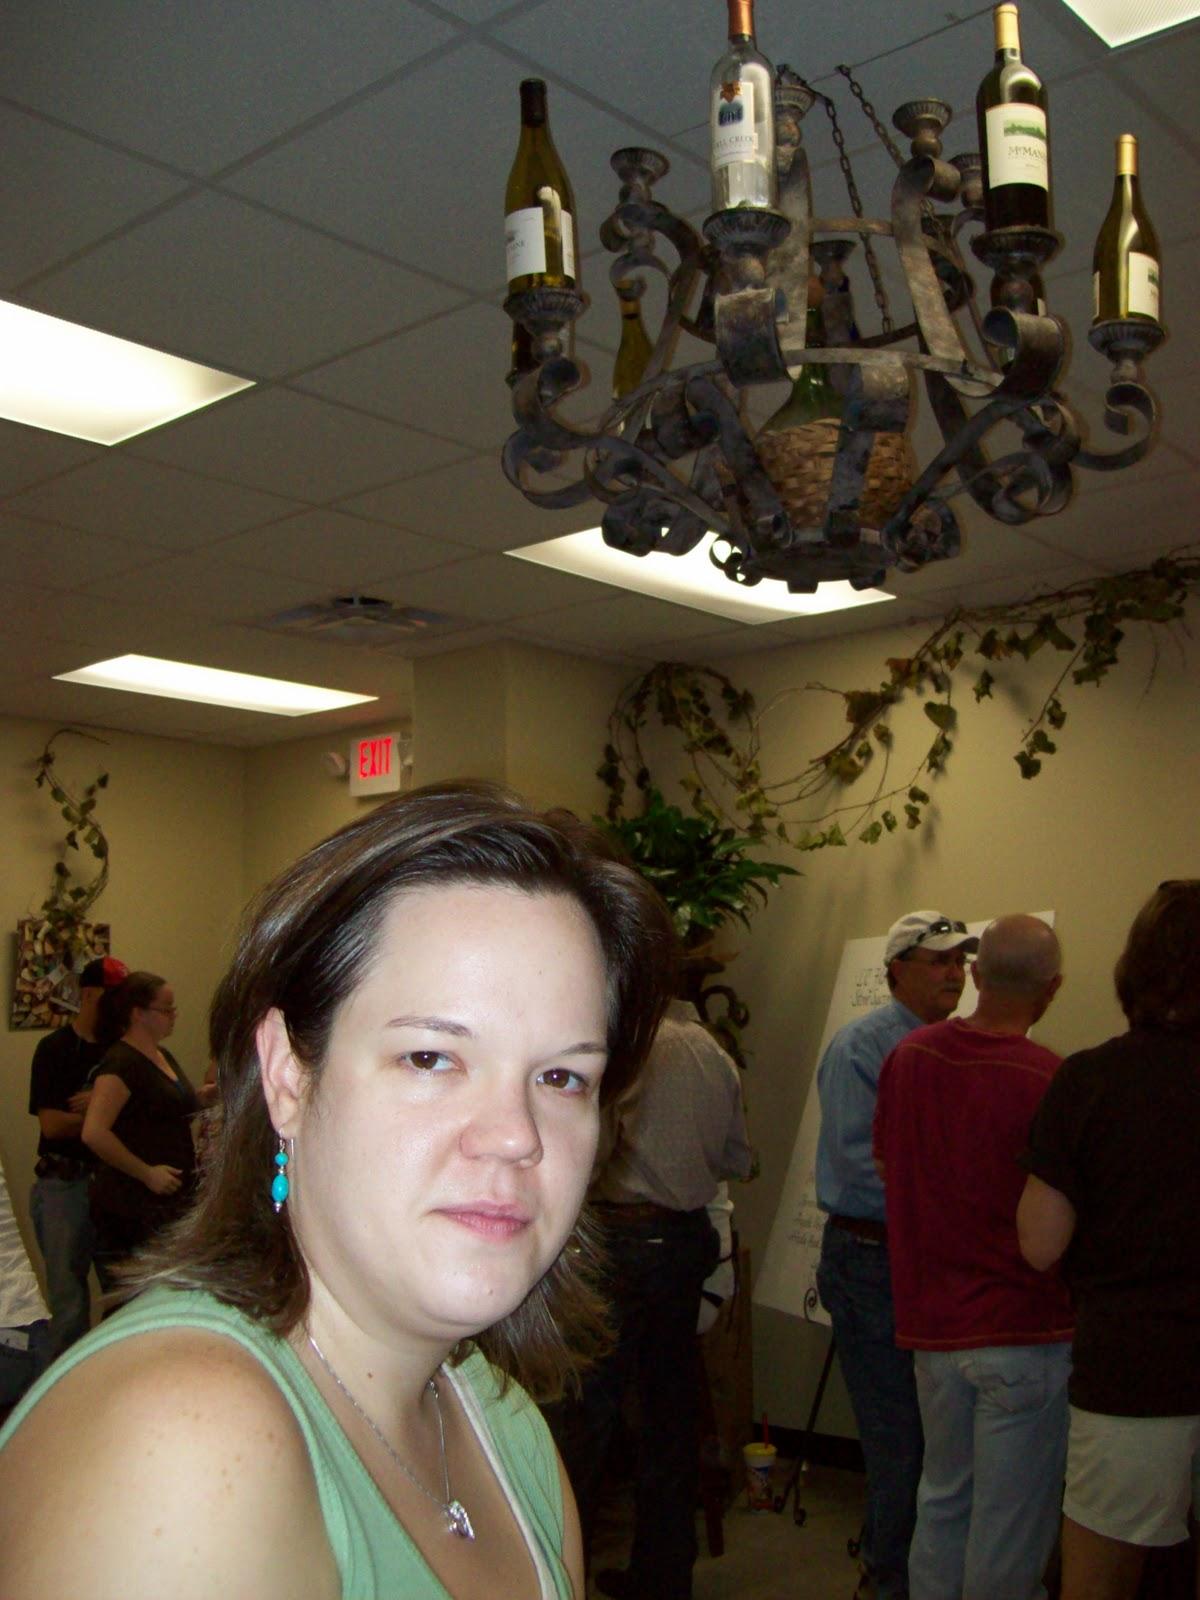 Fort Bend County Fair - 101_5438.JPG